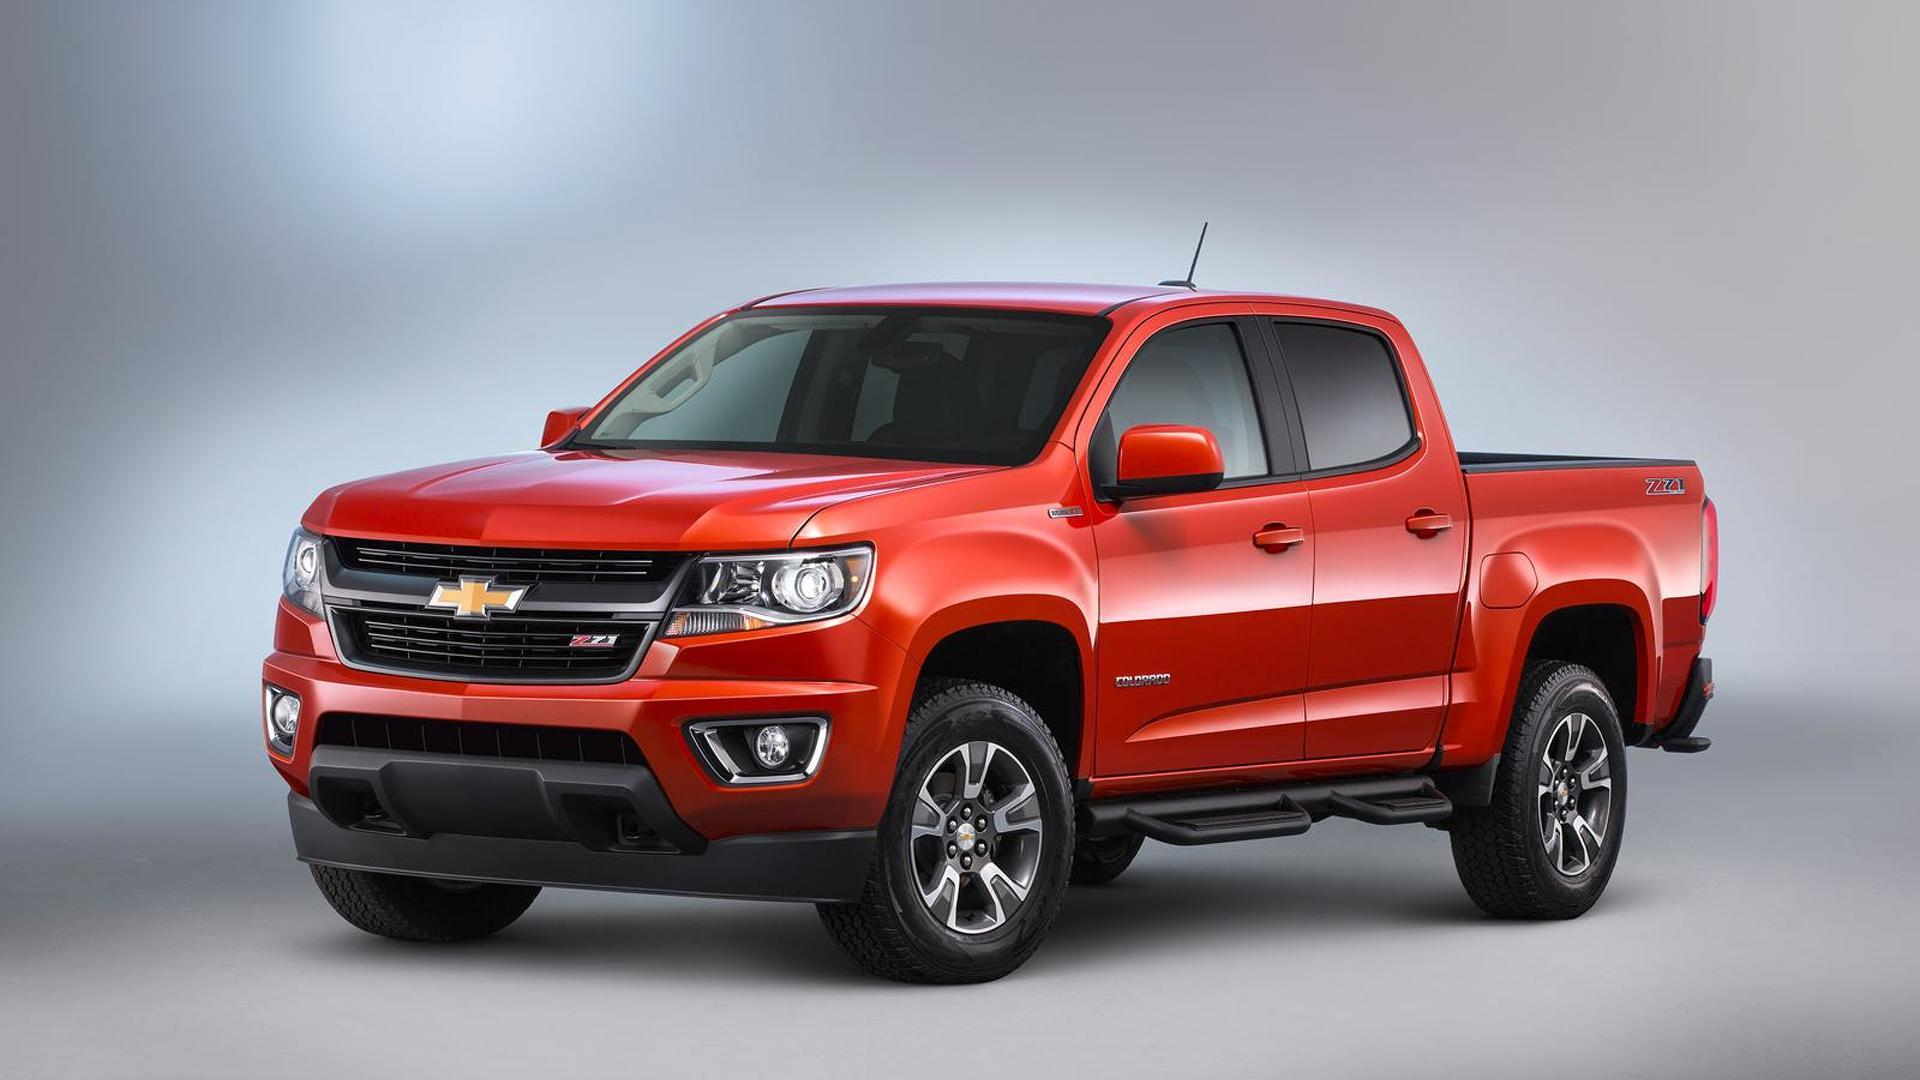 2.8 L Duramax >> Chevrolet Colorado and GMC Canyon gain 2.8-liter Duramax turbodiesel engine